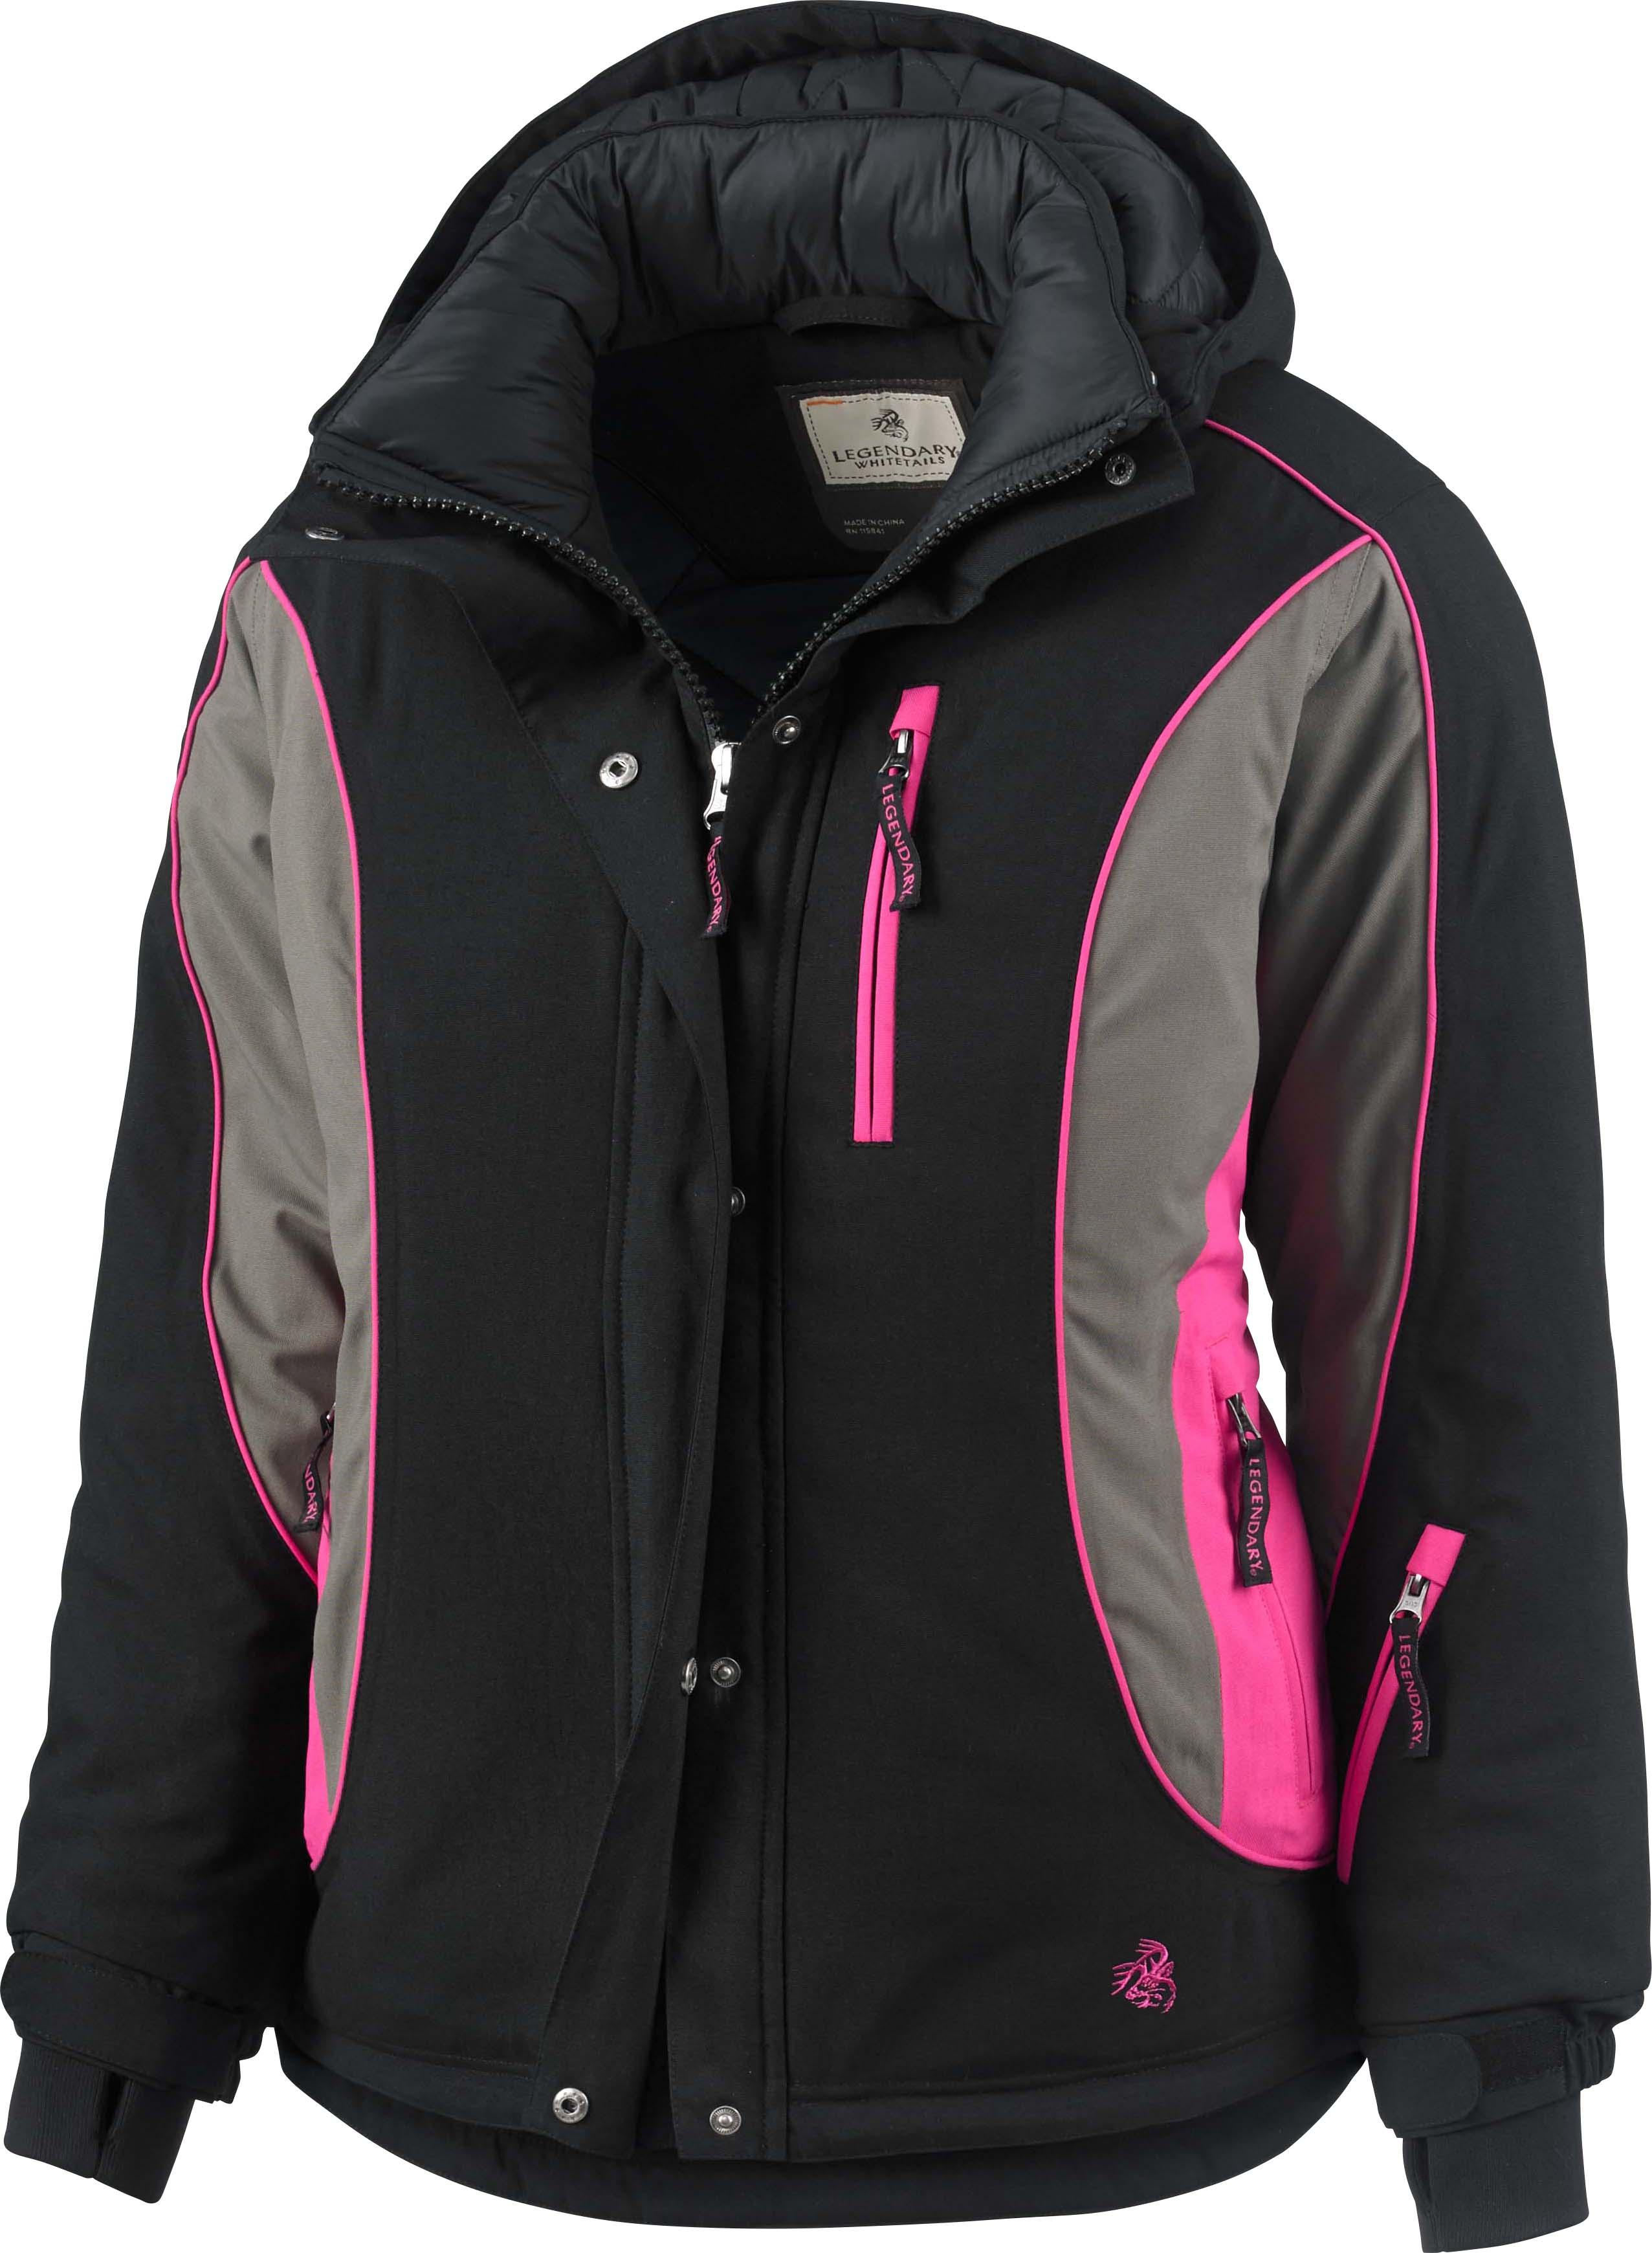 Ladies Polar Trail Pro Series Jacket Legendary Whitetails